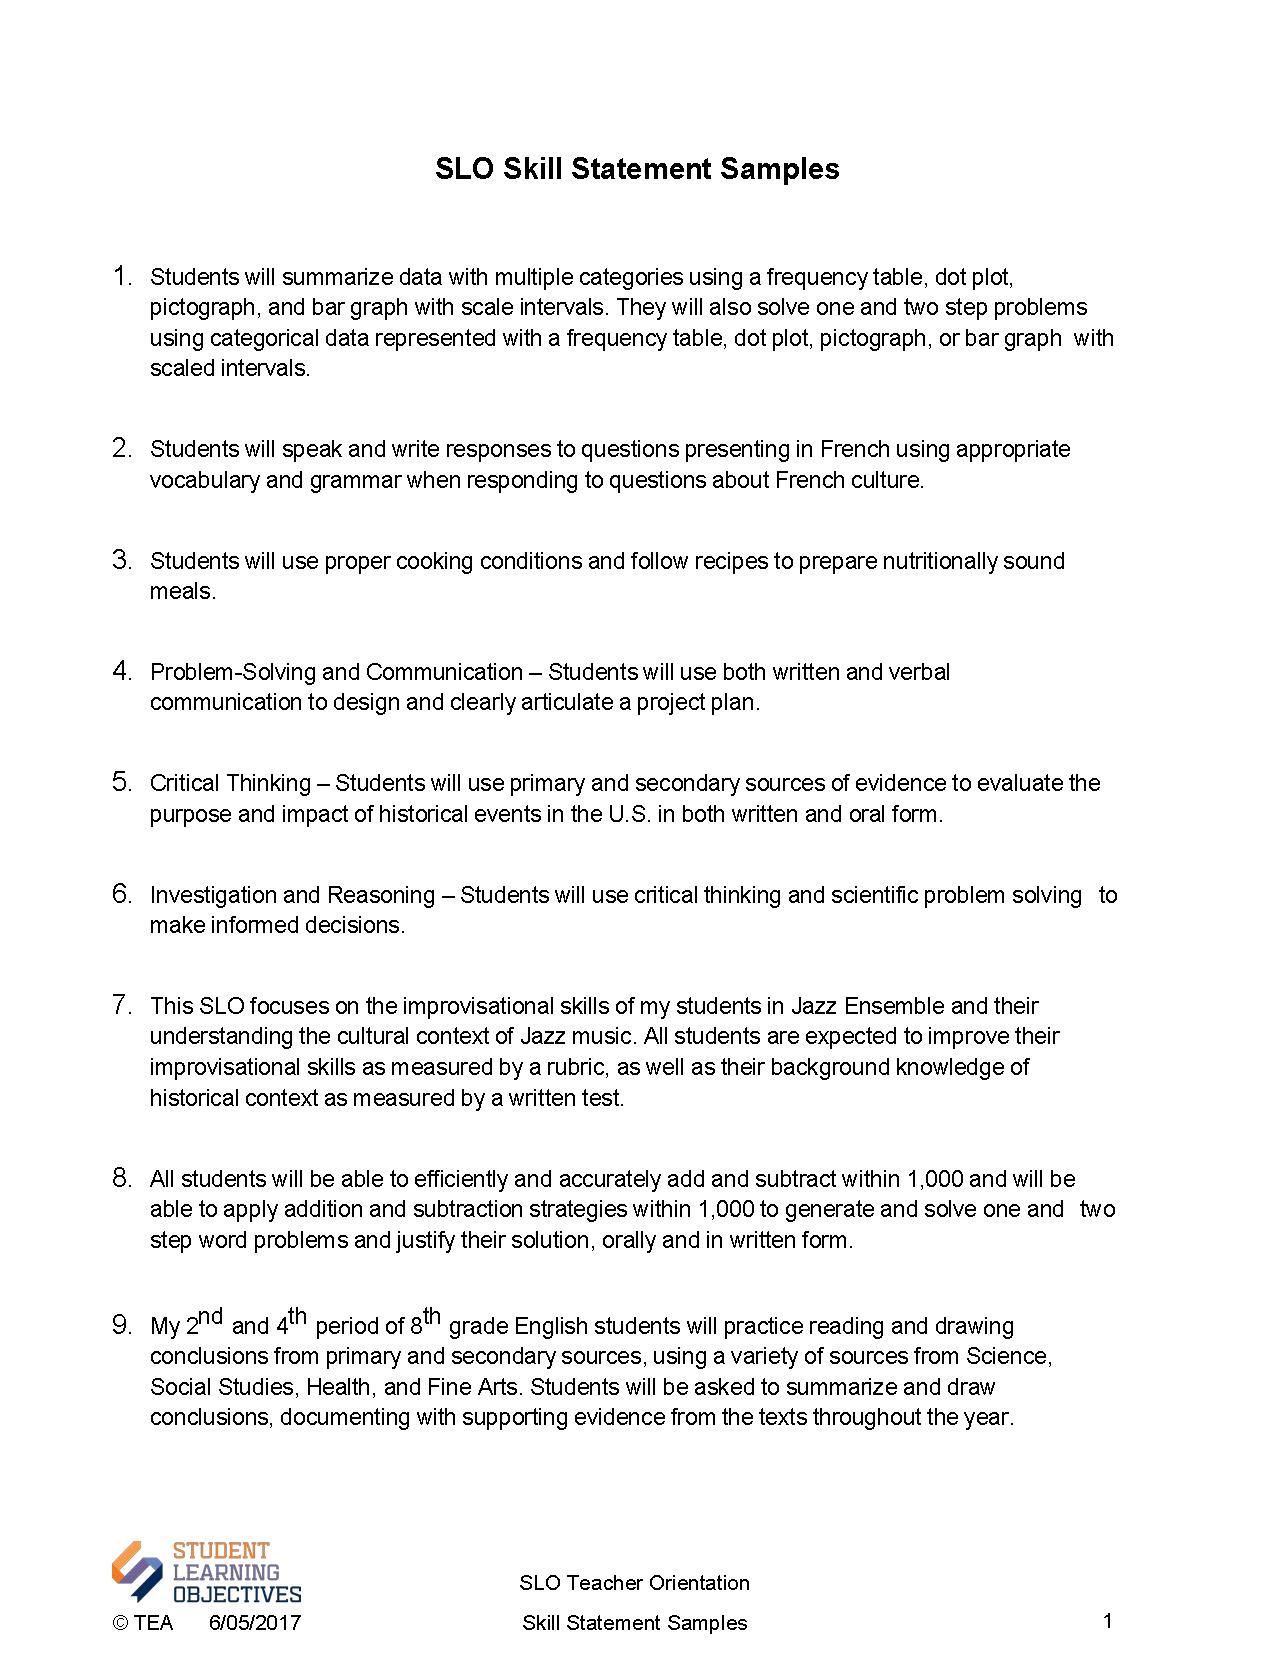 Orientation SLO – Orientation Evaluation Form